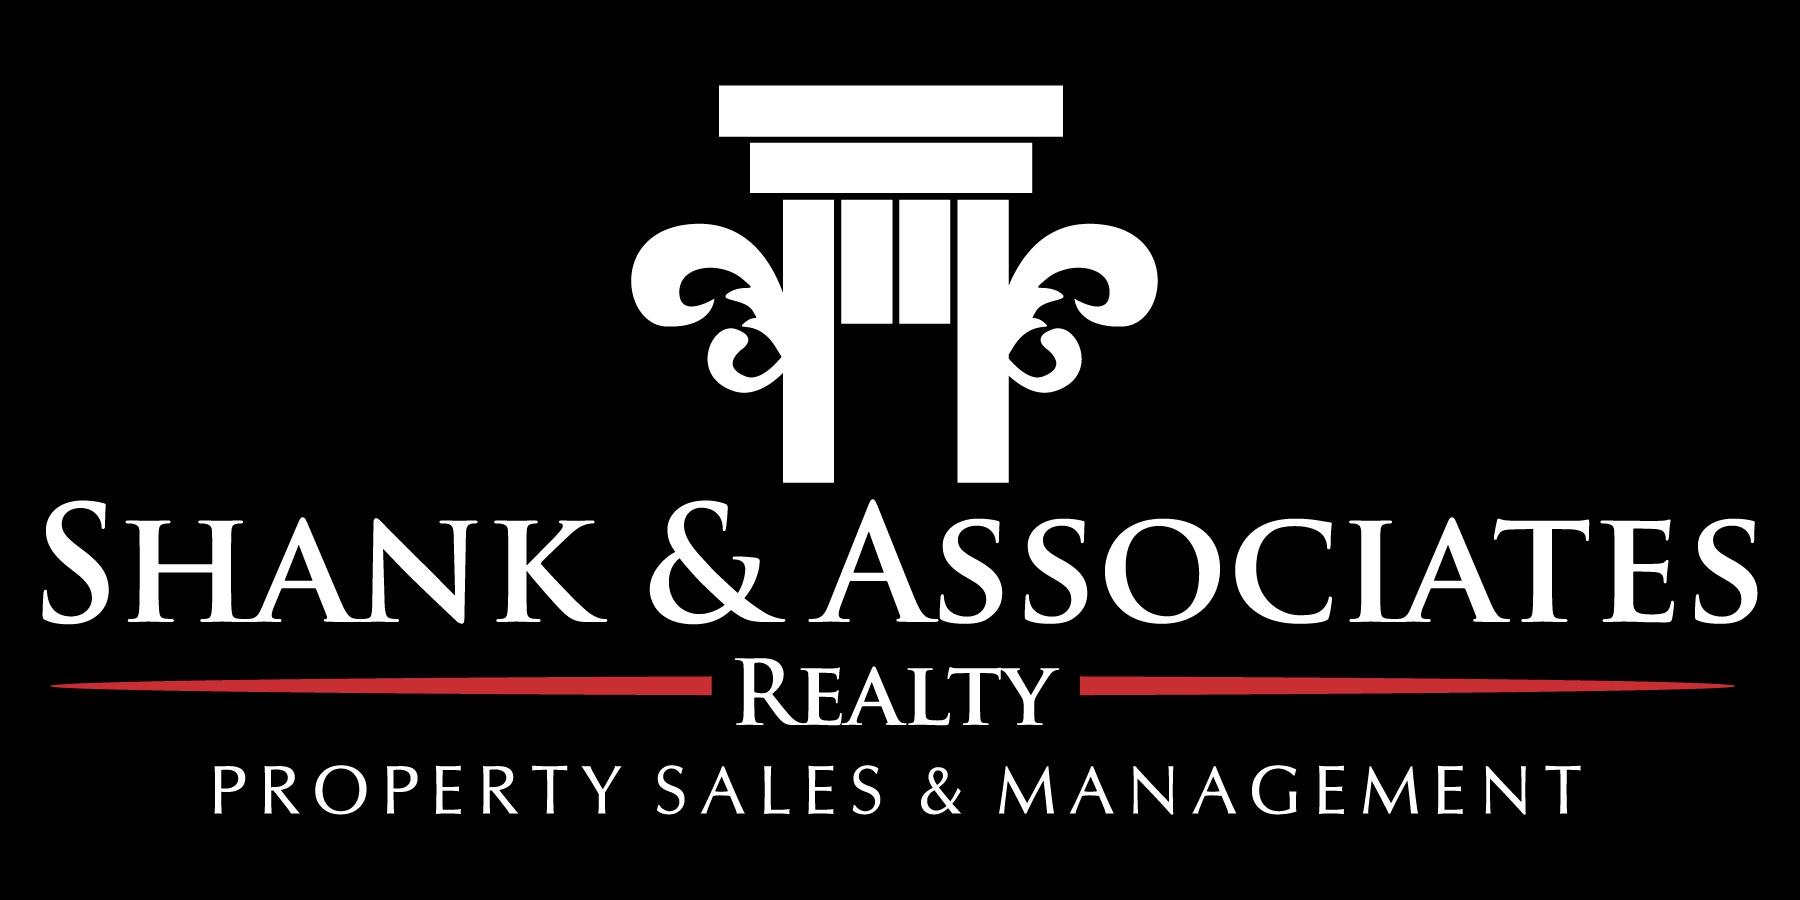 Shank & Associates Realty